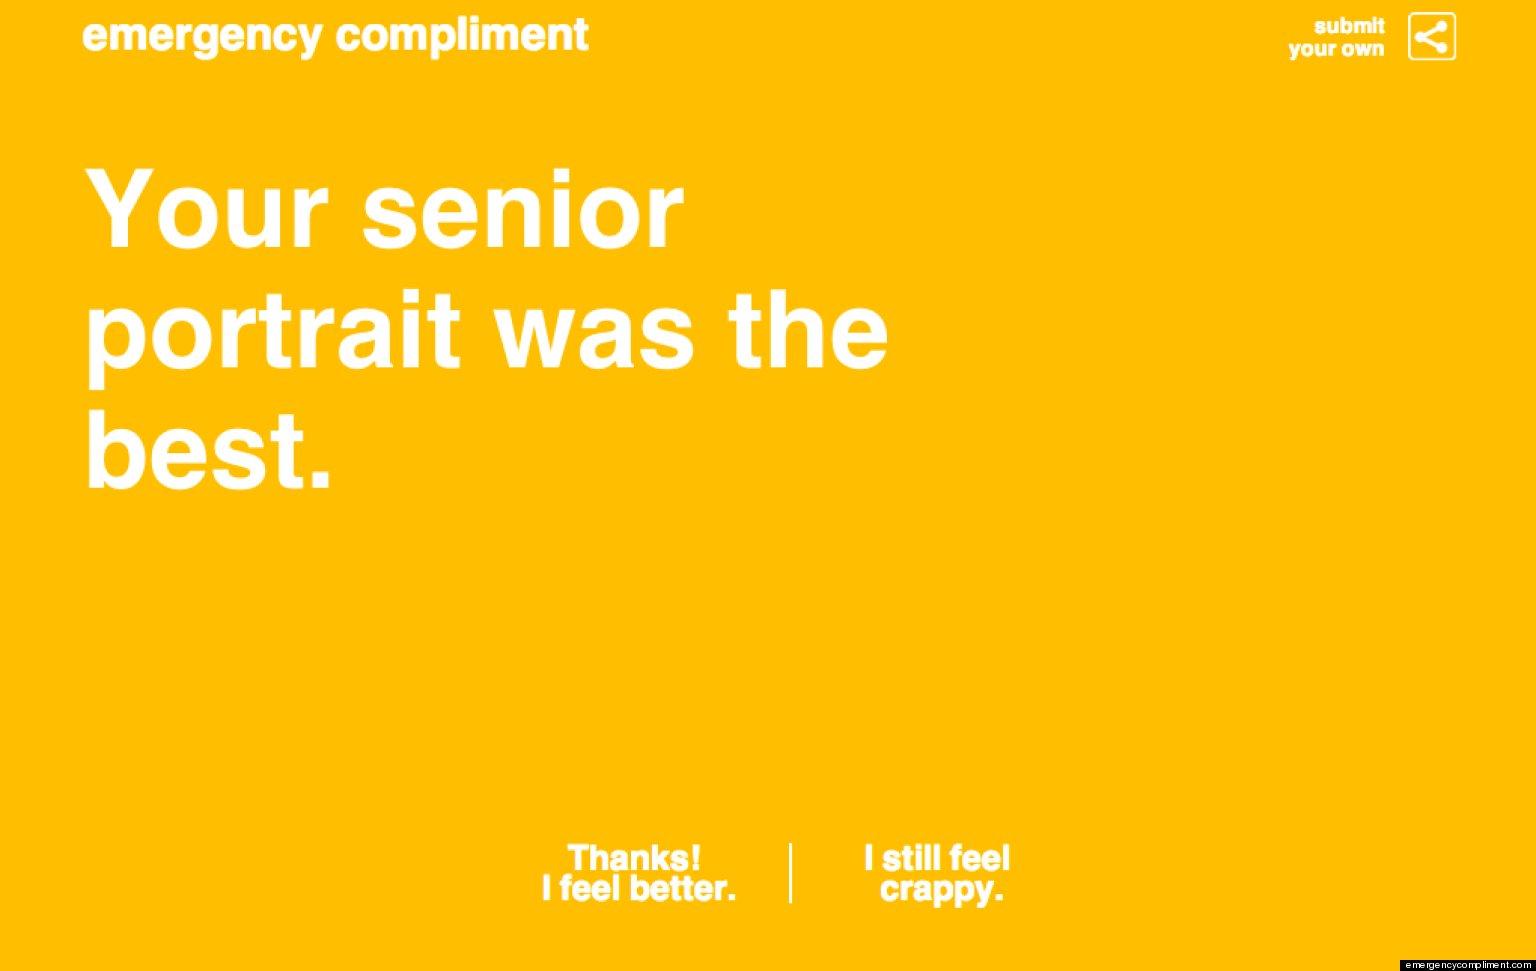 Random compliment generator